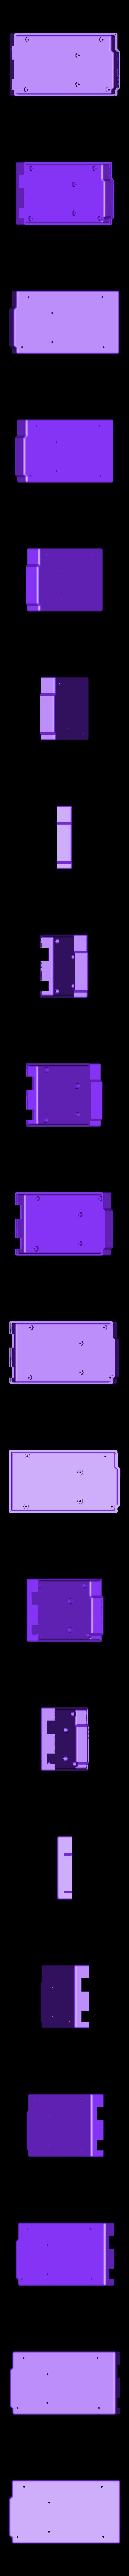 arduino_mega_bottom.stl Download free STL file Arduino Mega 2560 Snug Case • 3D printer design, Aralala